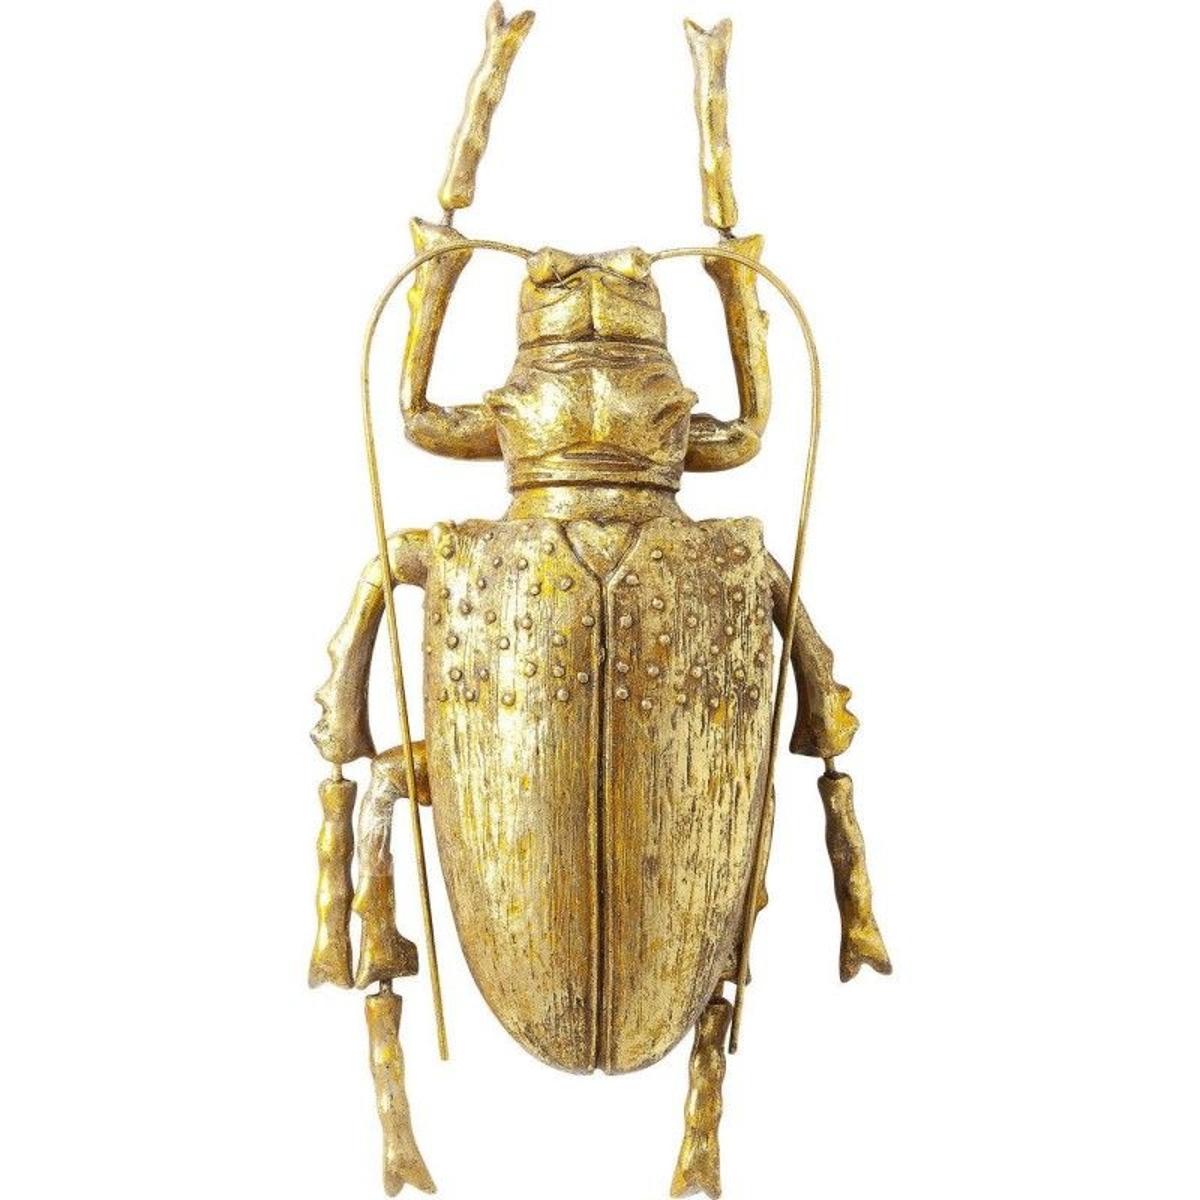 Déco murale Longicorn Beetle dorée Kare Design